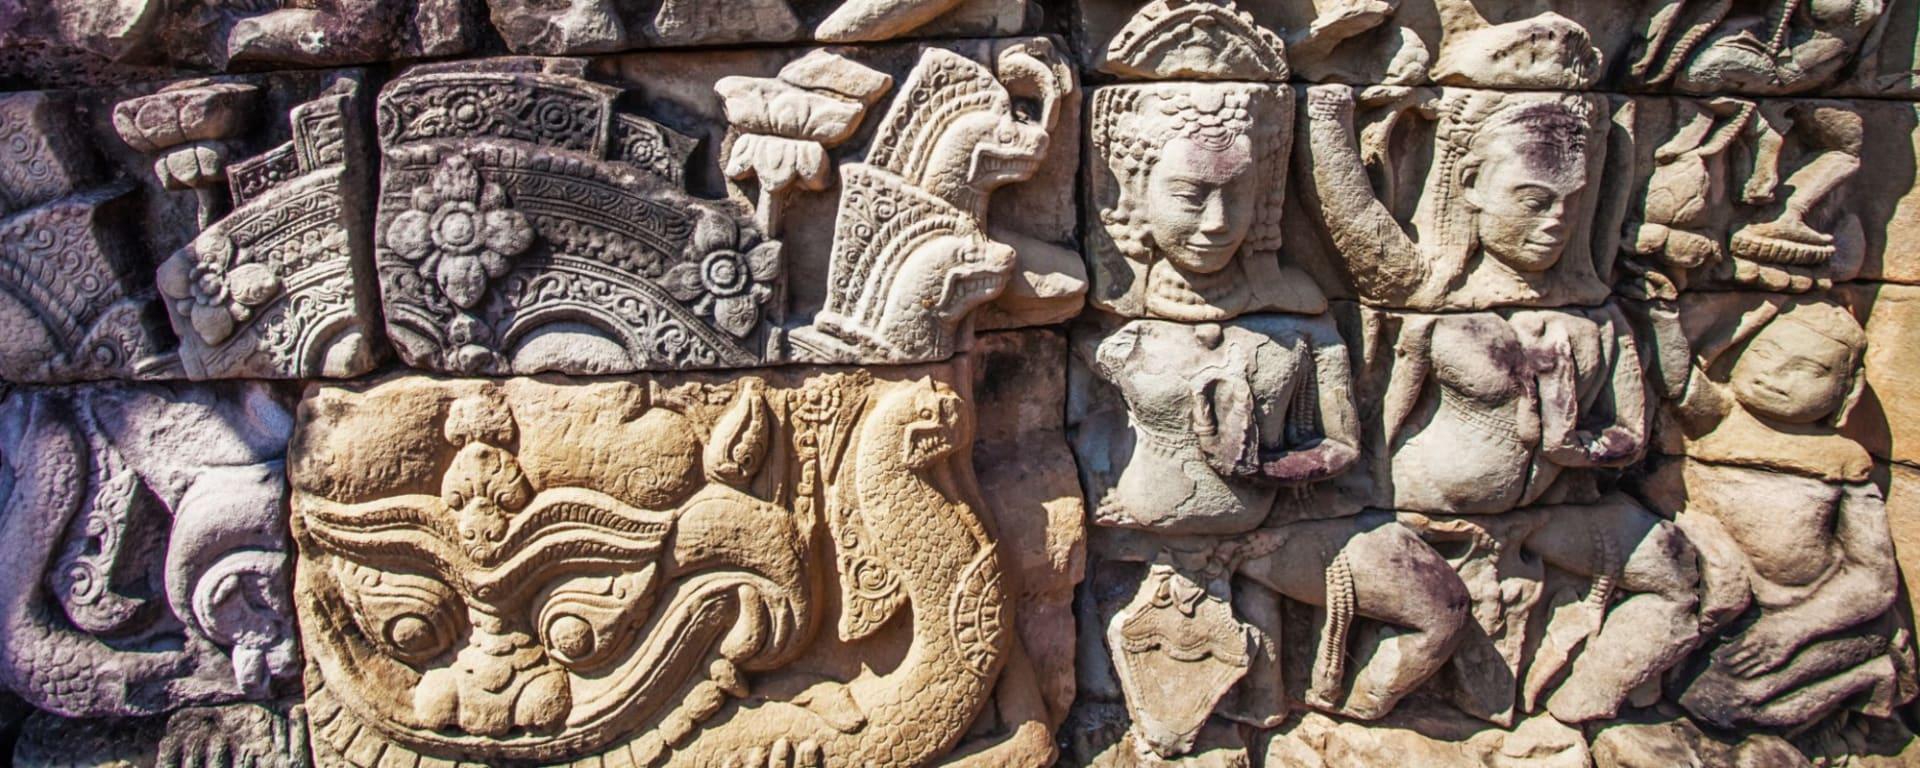 Découverte active de la merveille d'Angkor de Siem Reap: Siem Reap Angkor Wat